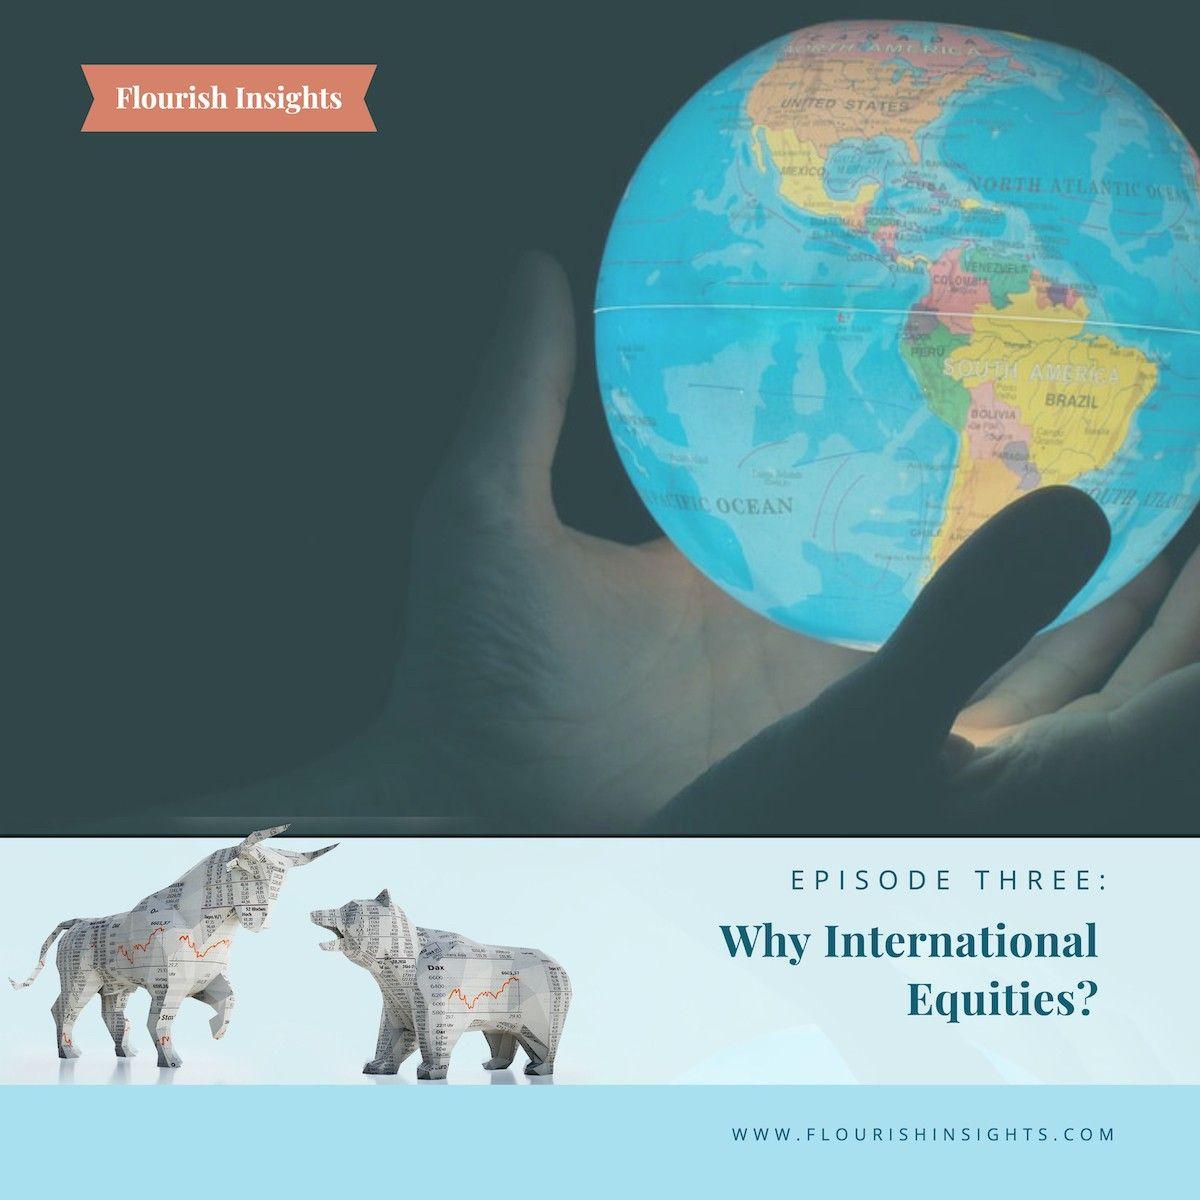 Why International Equities?